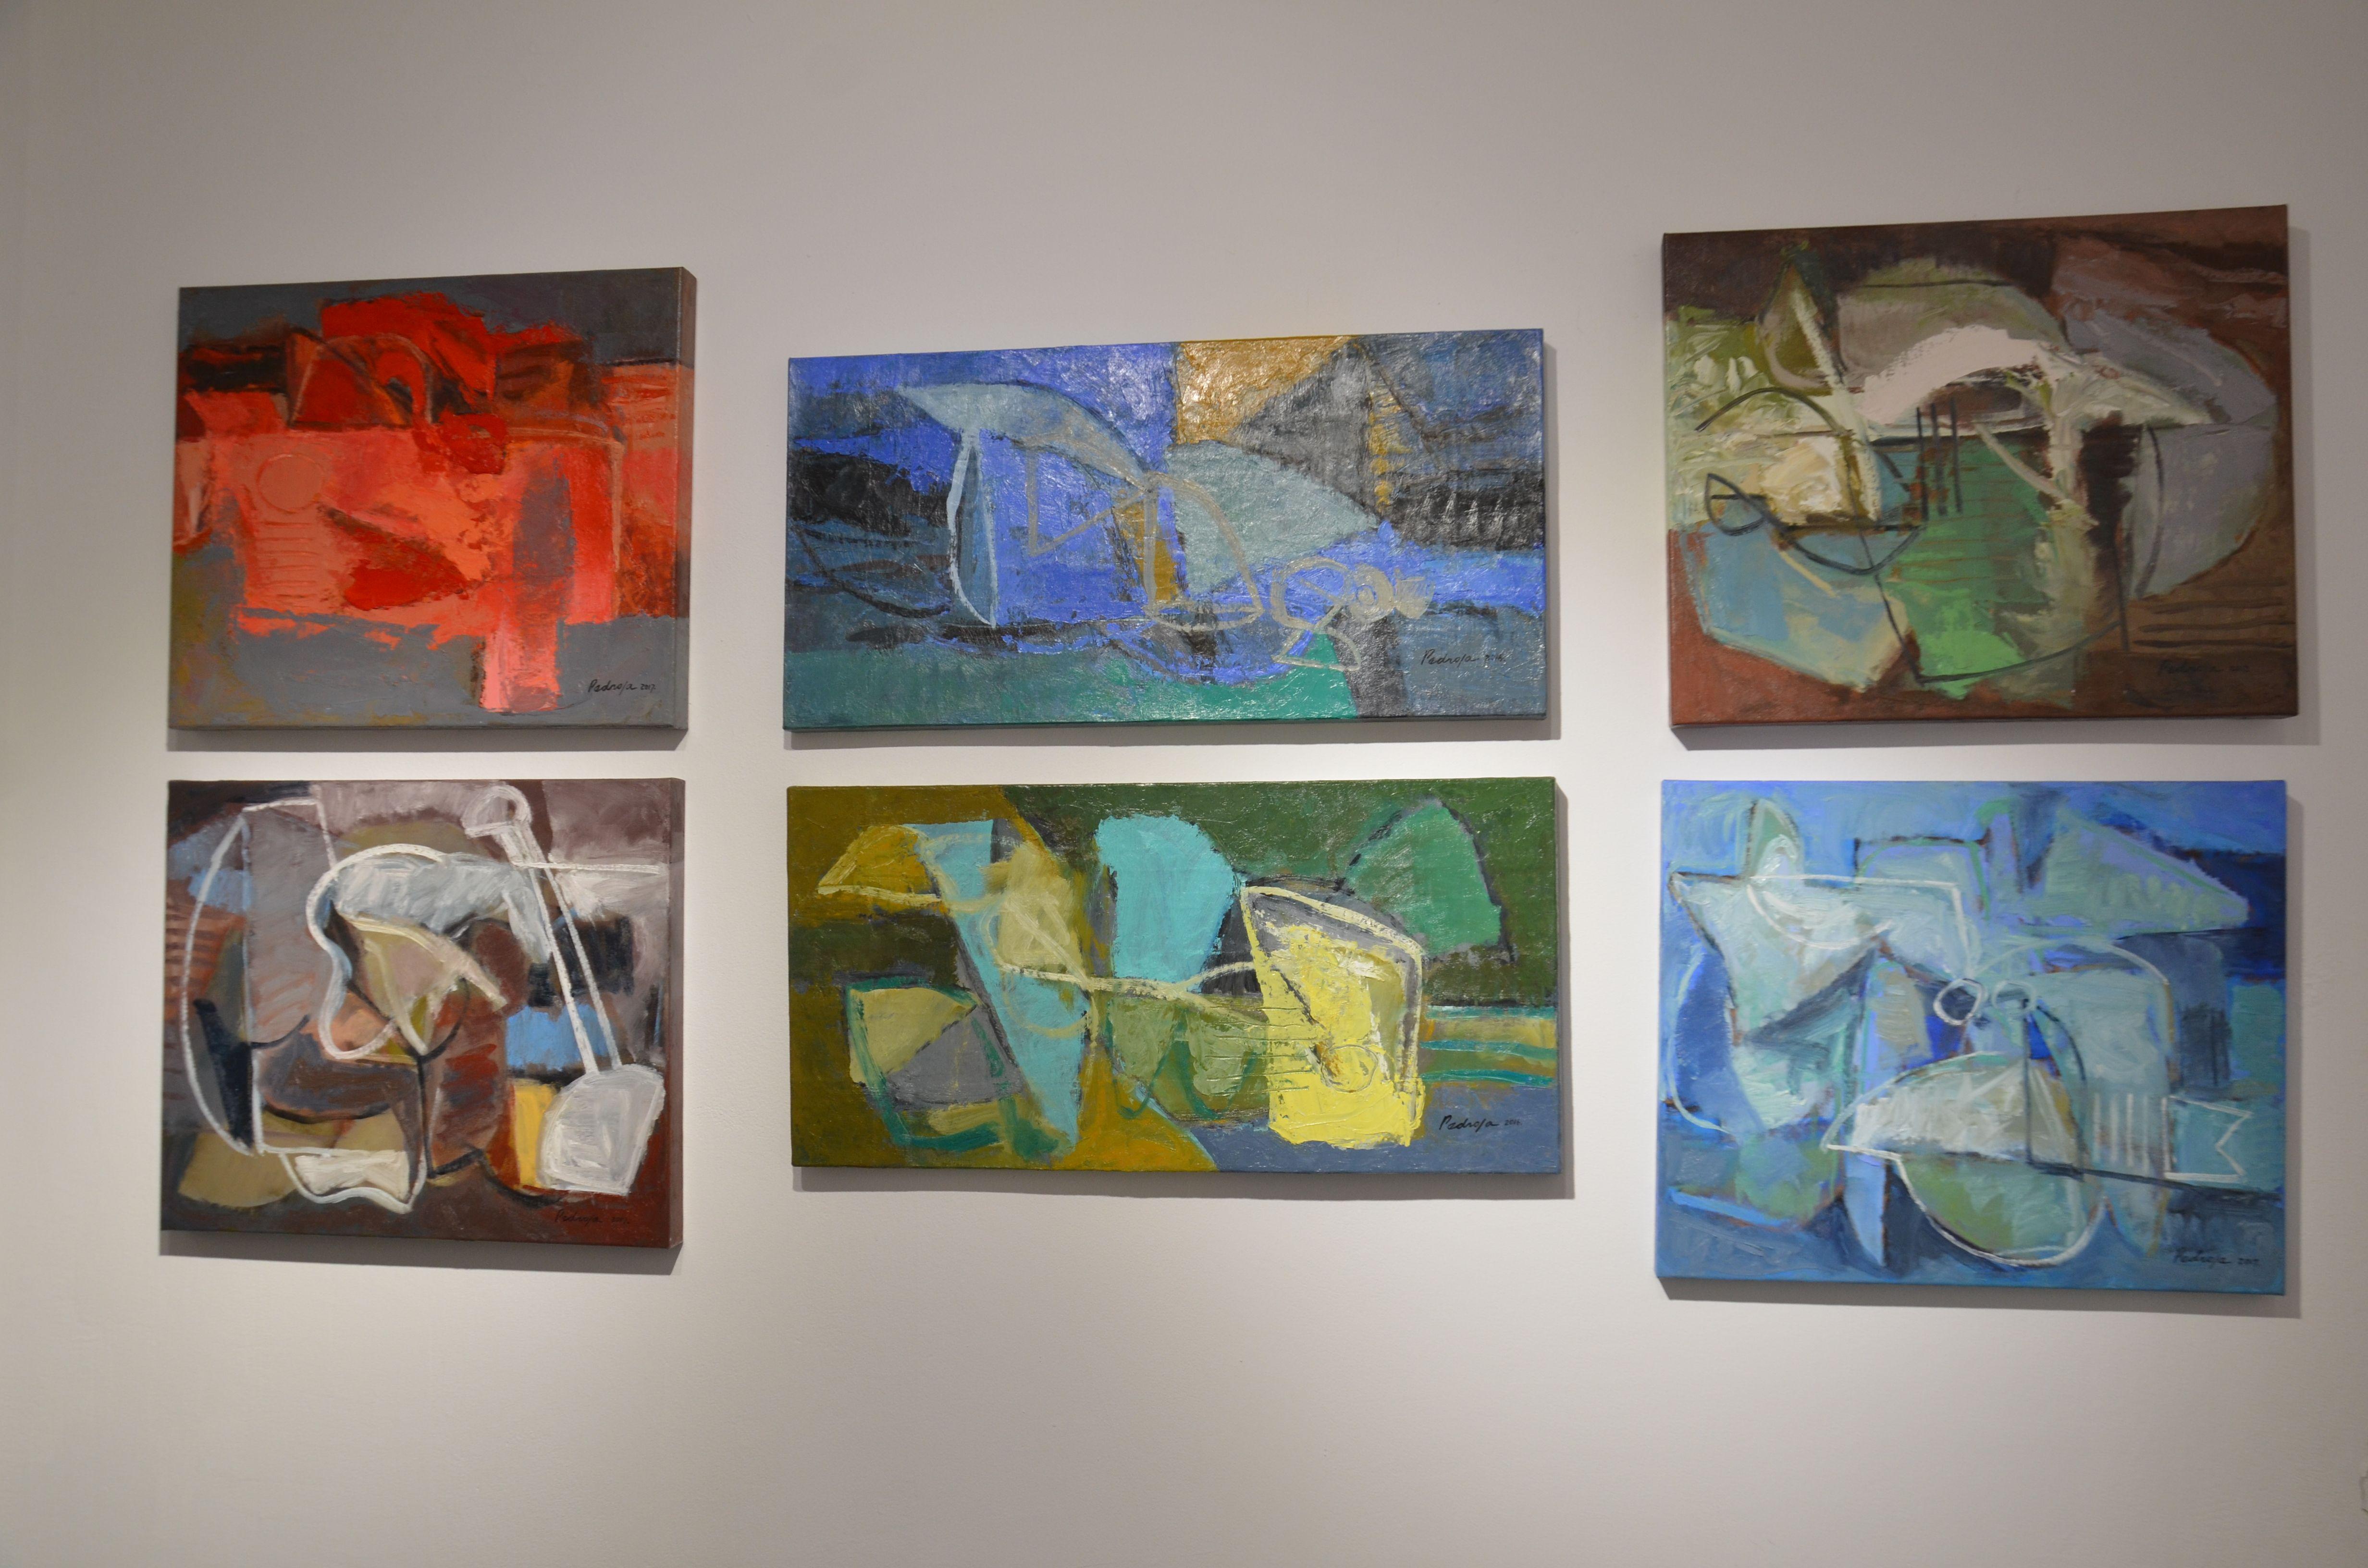 Mulas and Pedrosa Gallery, Barcelona